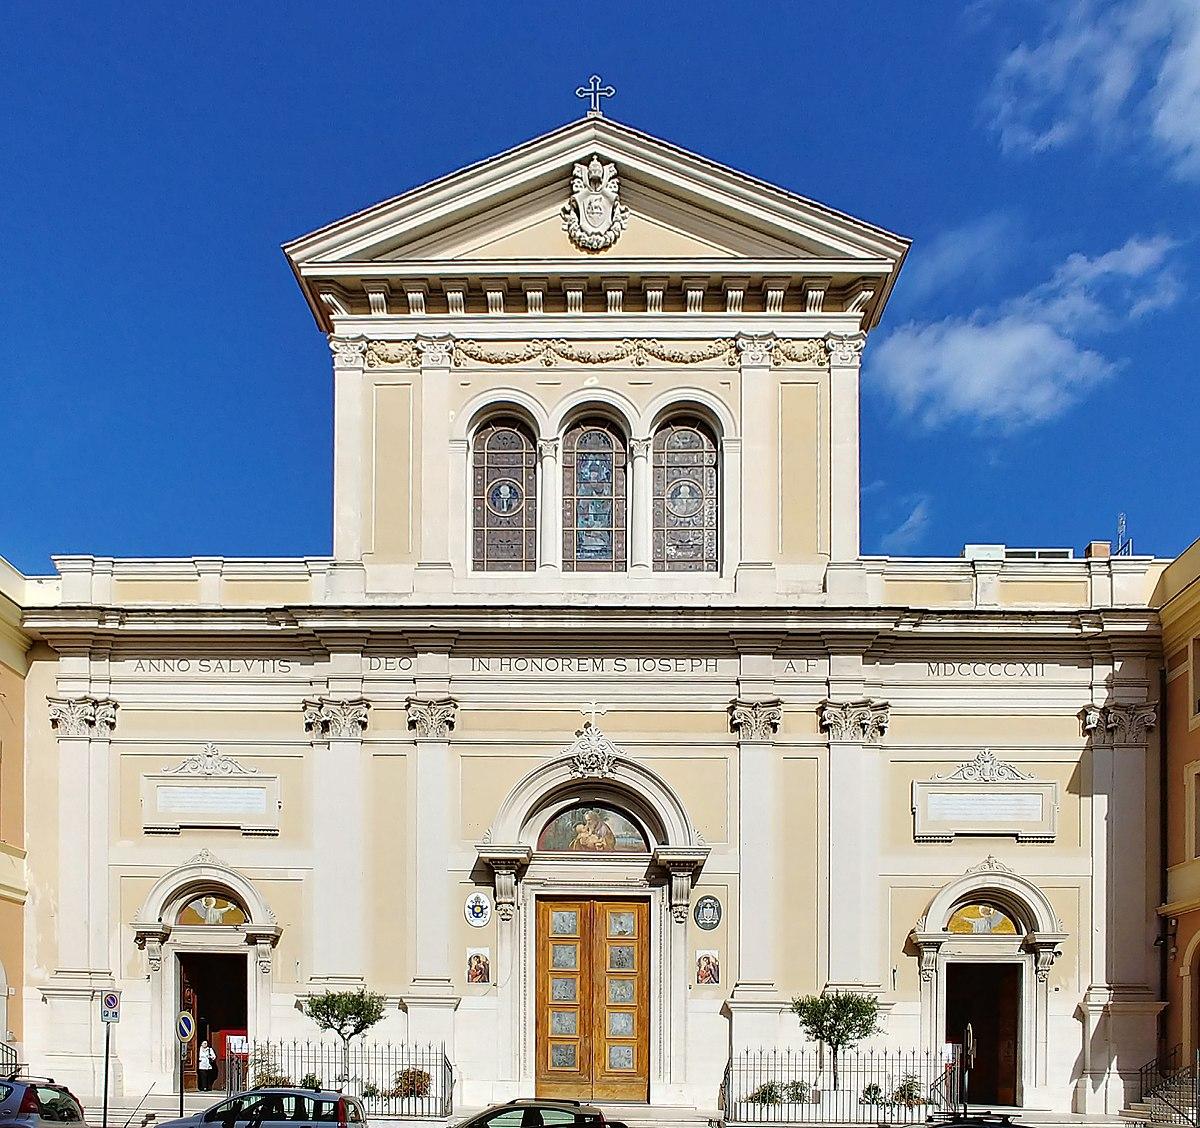 Basilica di san giuseppe al trionfale wikipedia for Di giuseppe arredamenti roma